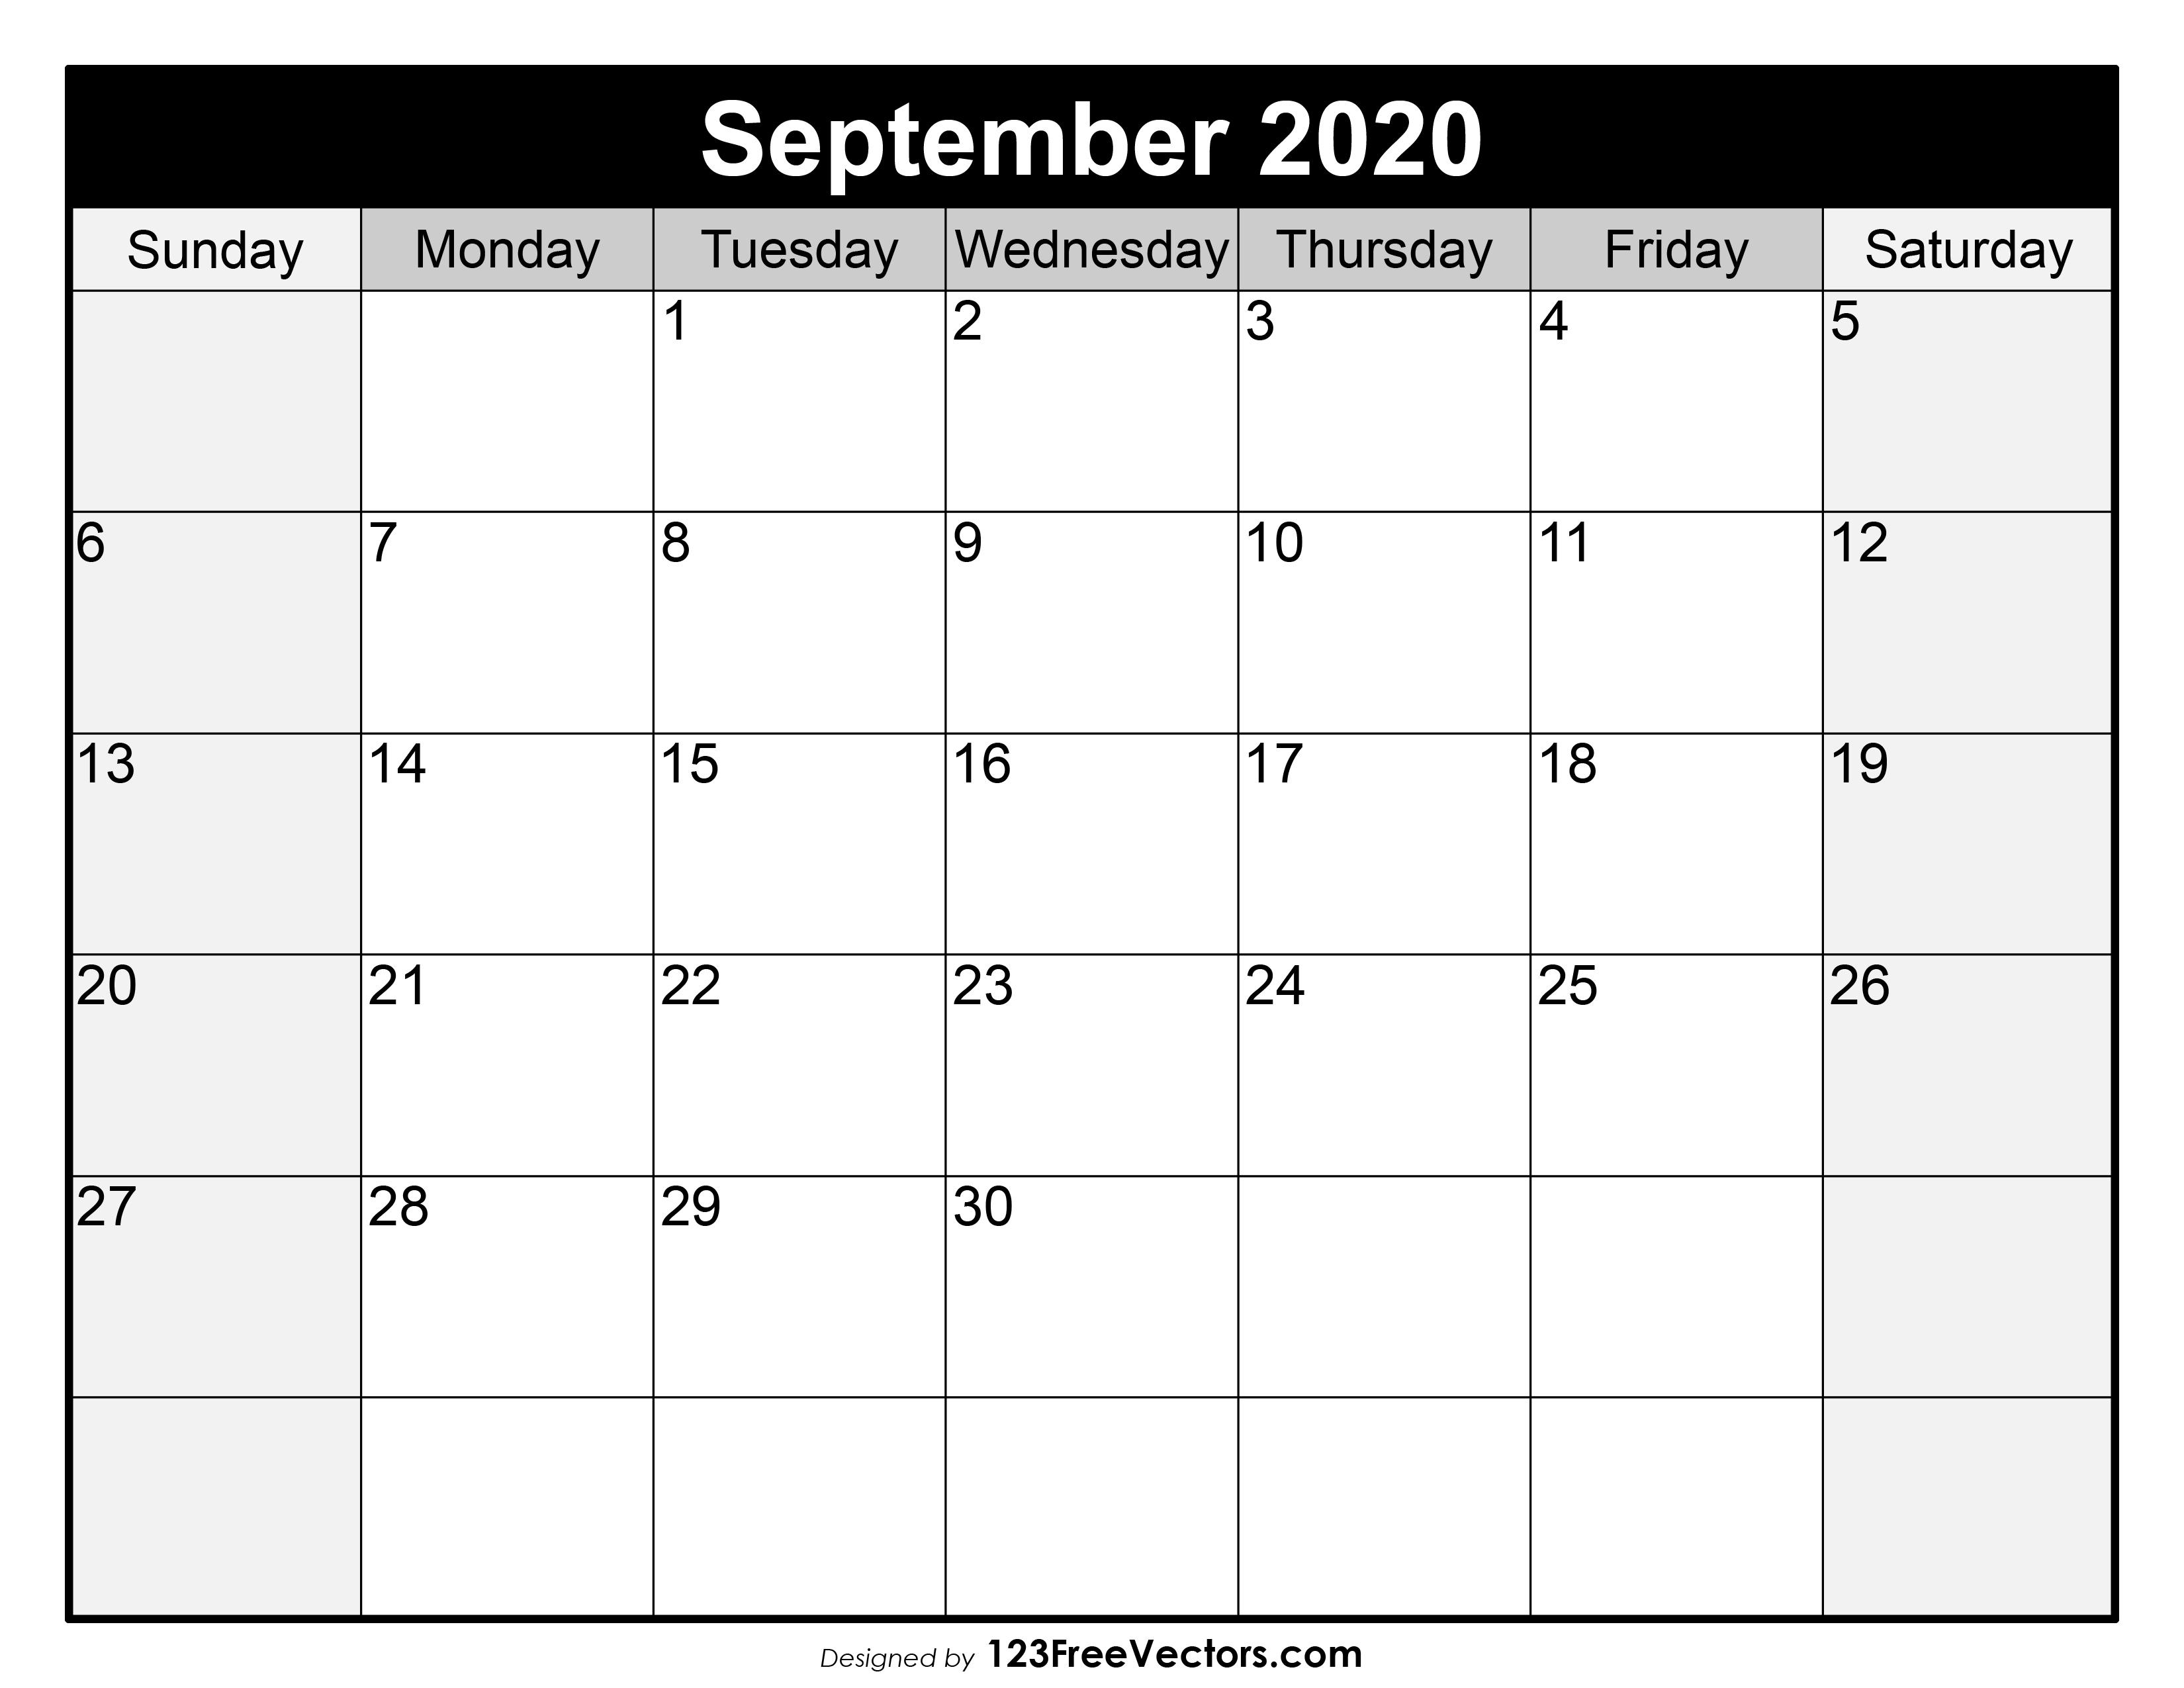 September 2020 - calendar templates for Word, Excel and PDF   Creative Calendar 2020 September